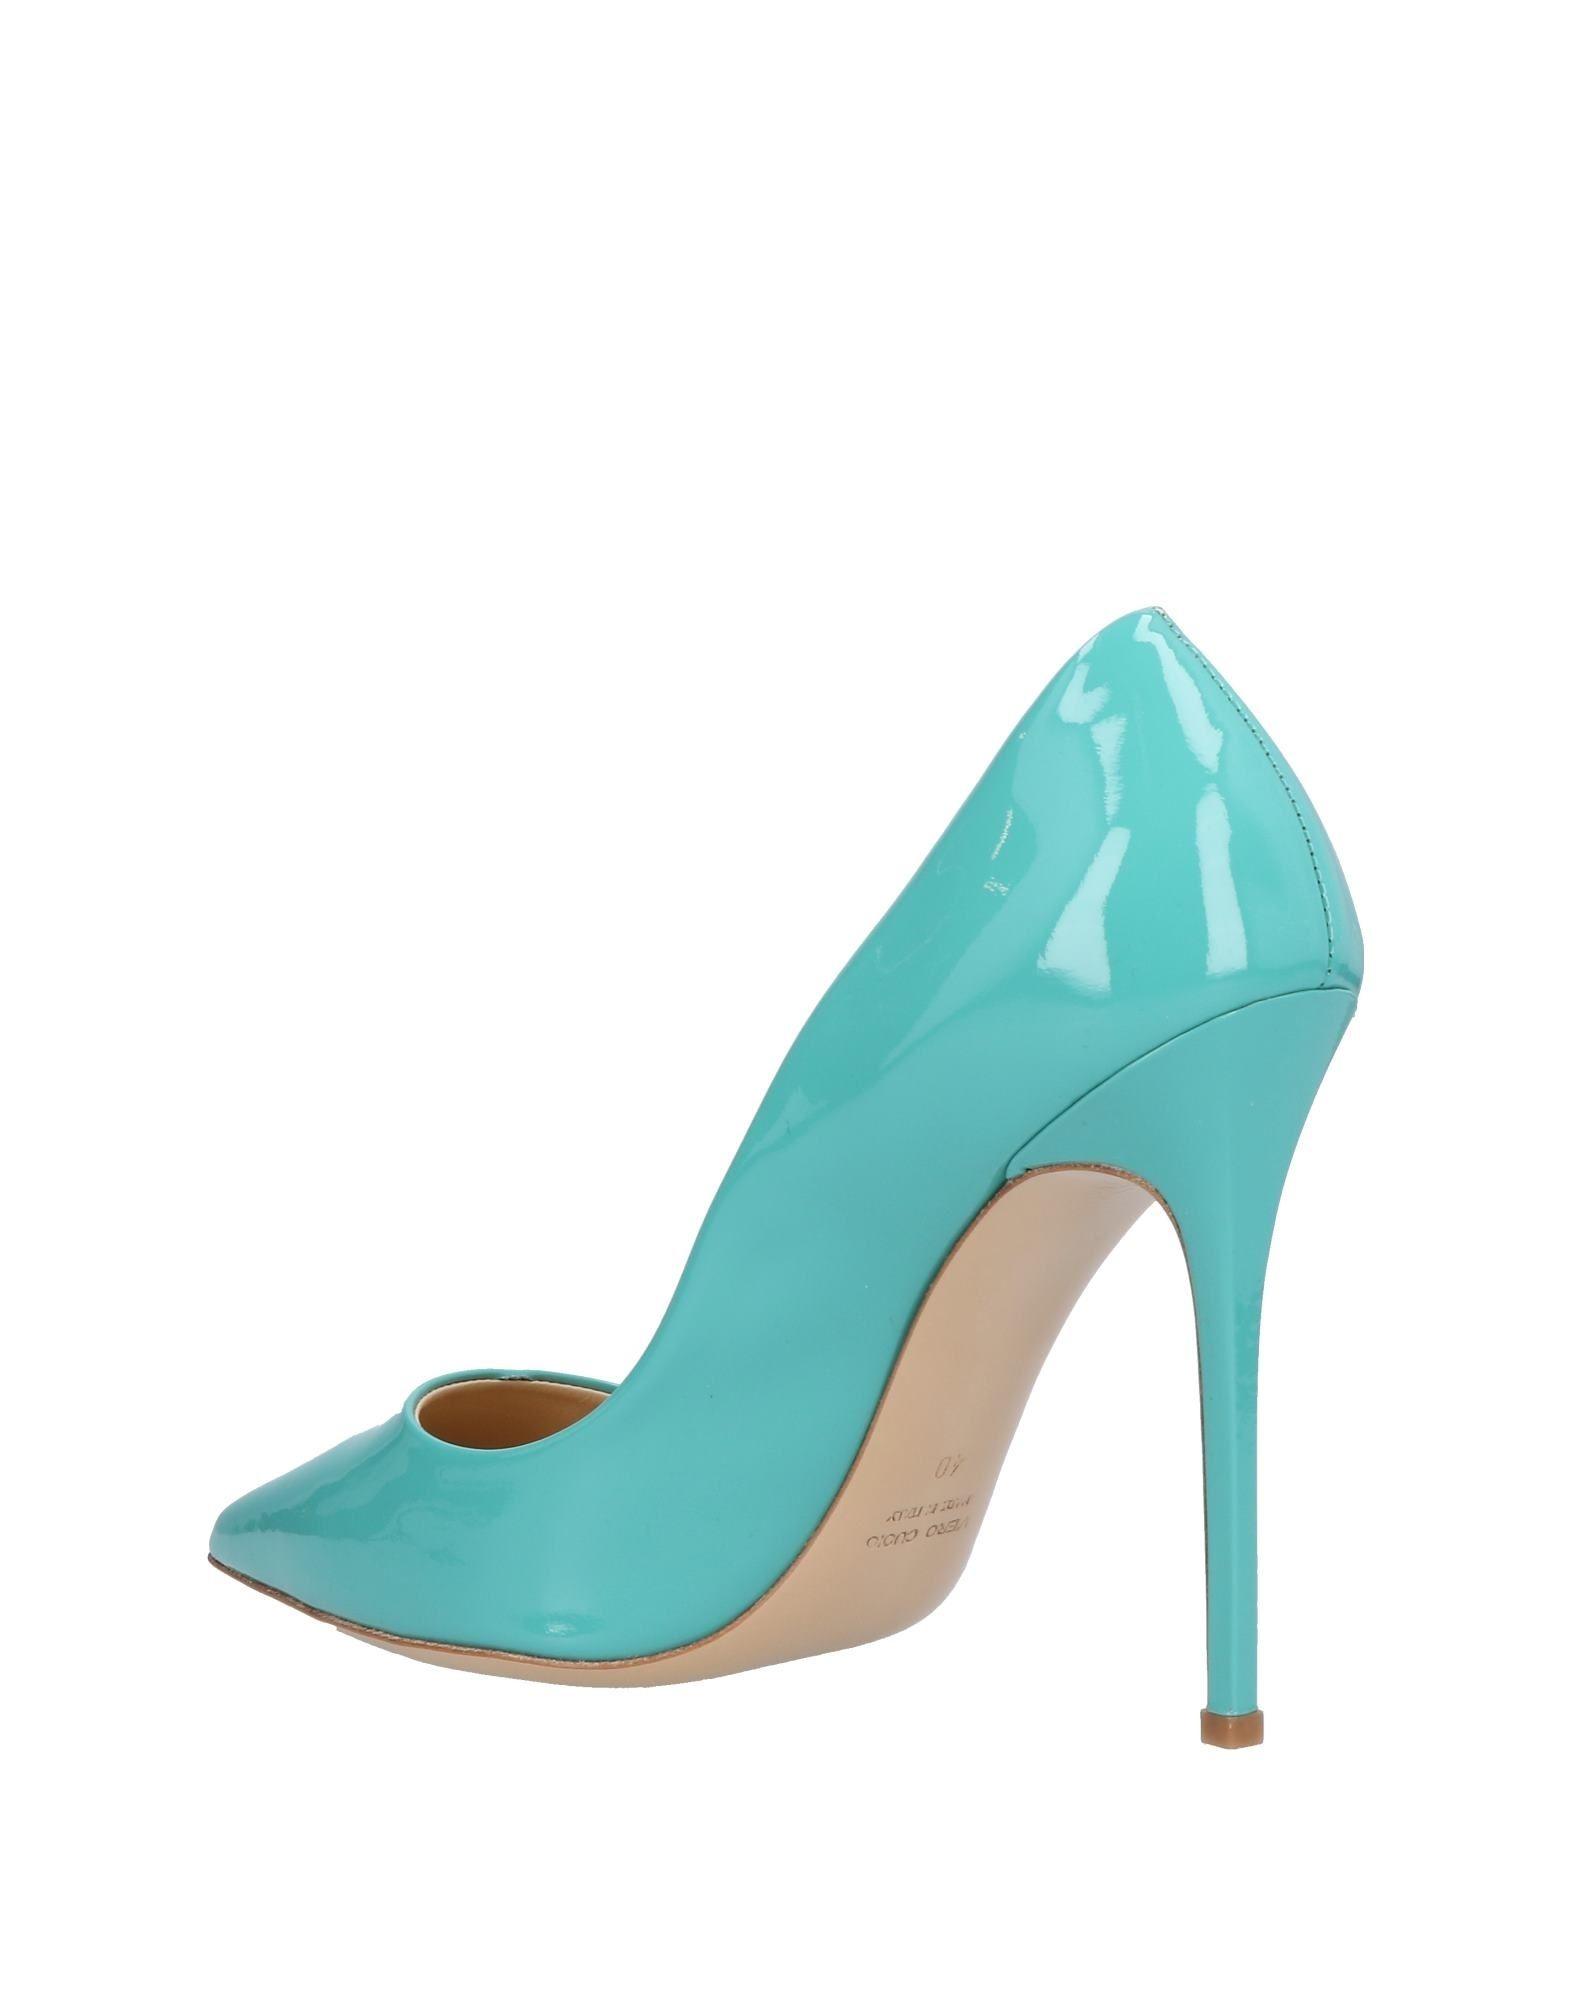 Stilvolle Stilvolle Stilvolle billige Schuhe Chon Per Mario Zamagna Pumps Damen  11221272HK 20a062